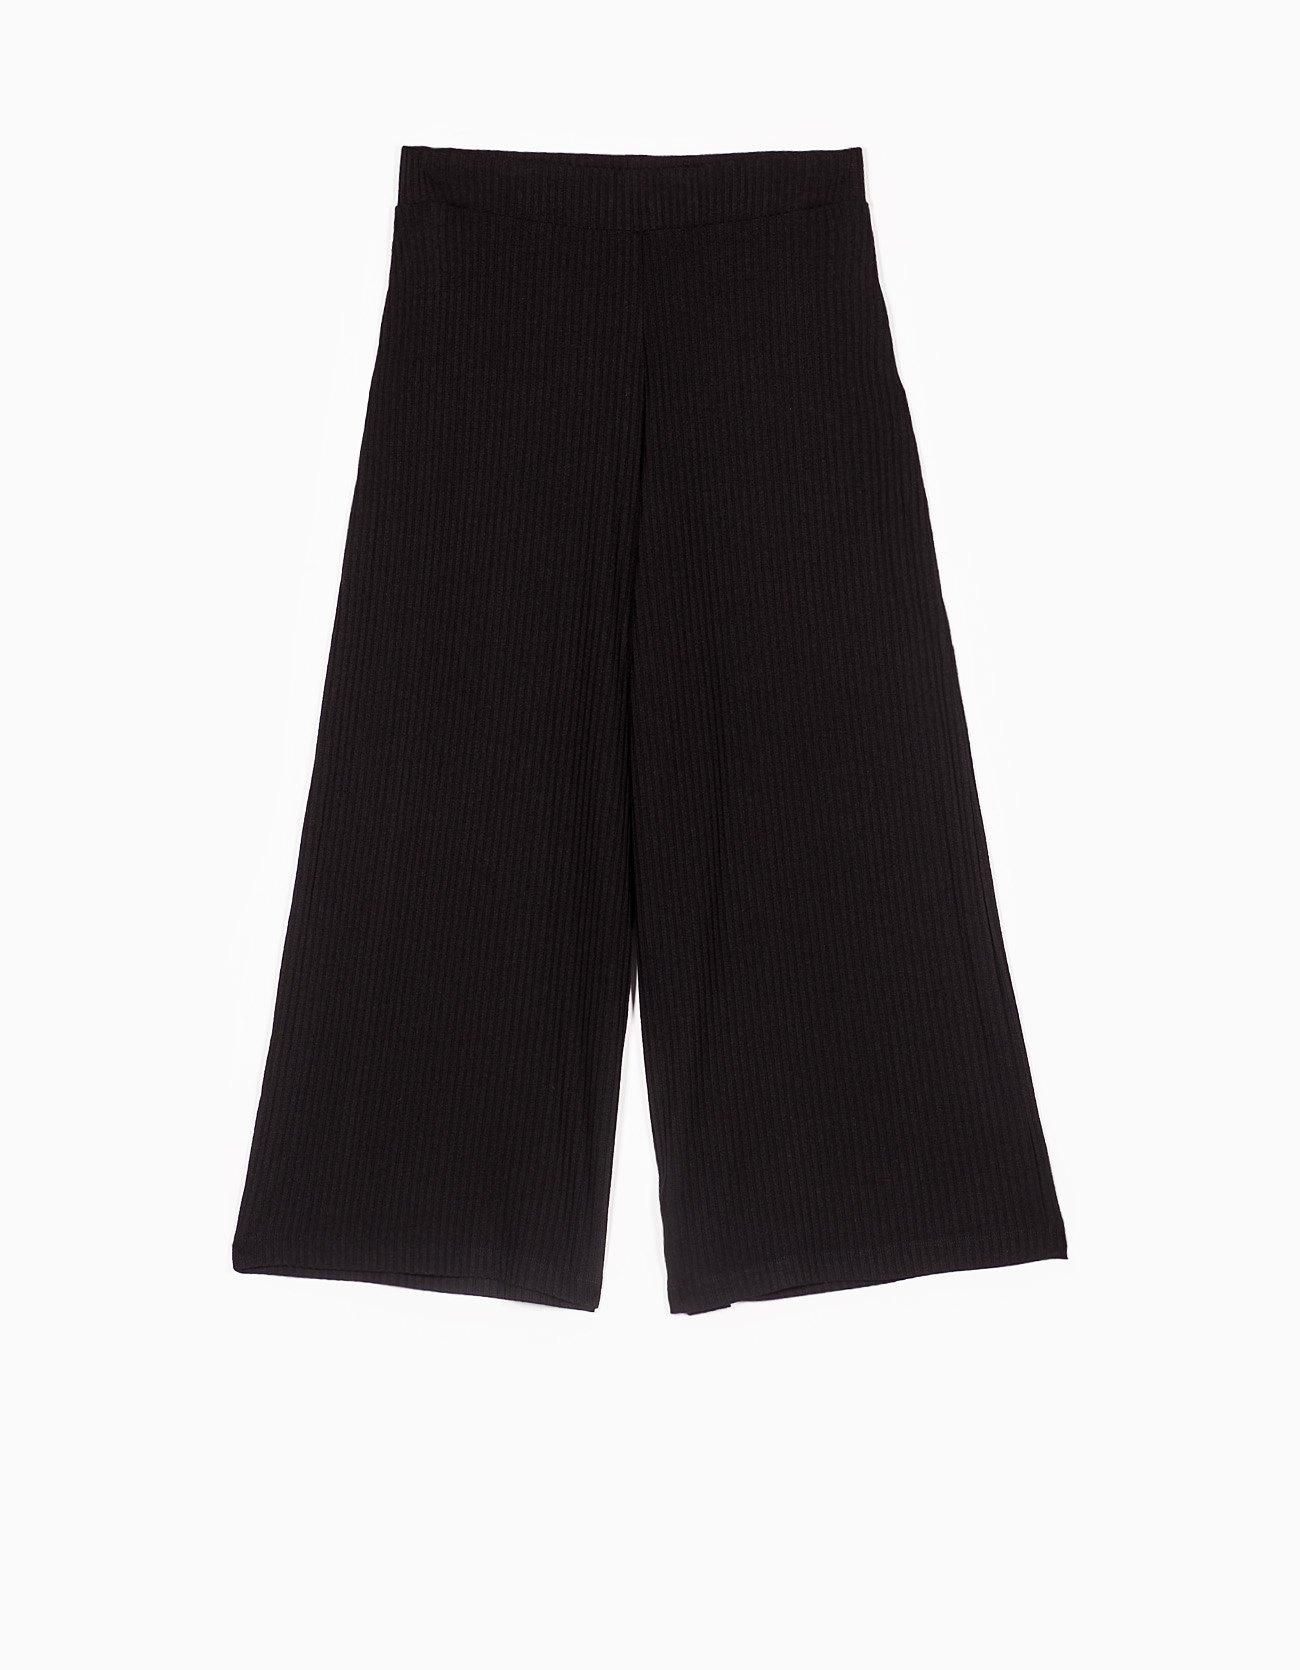 pantalons noirs